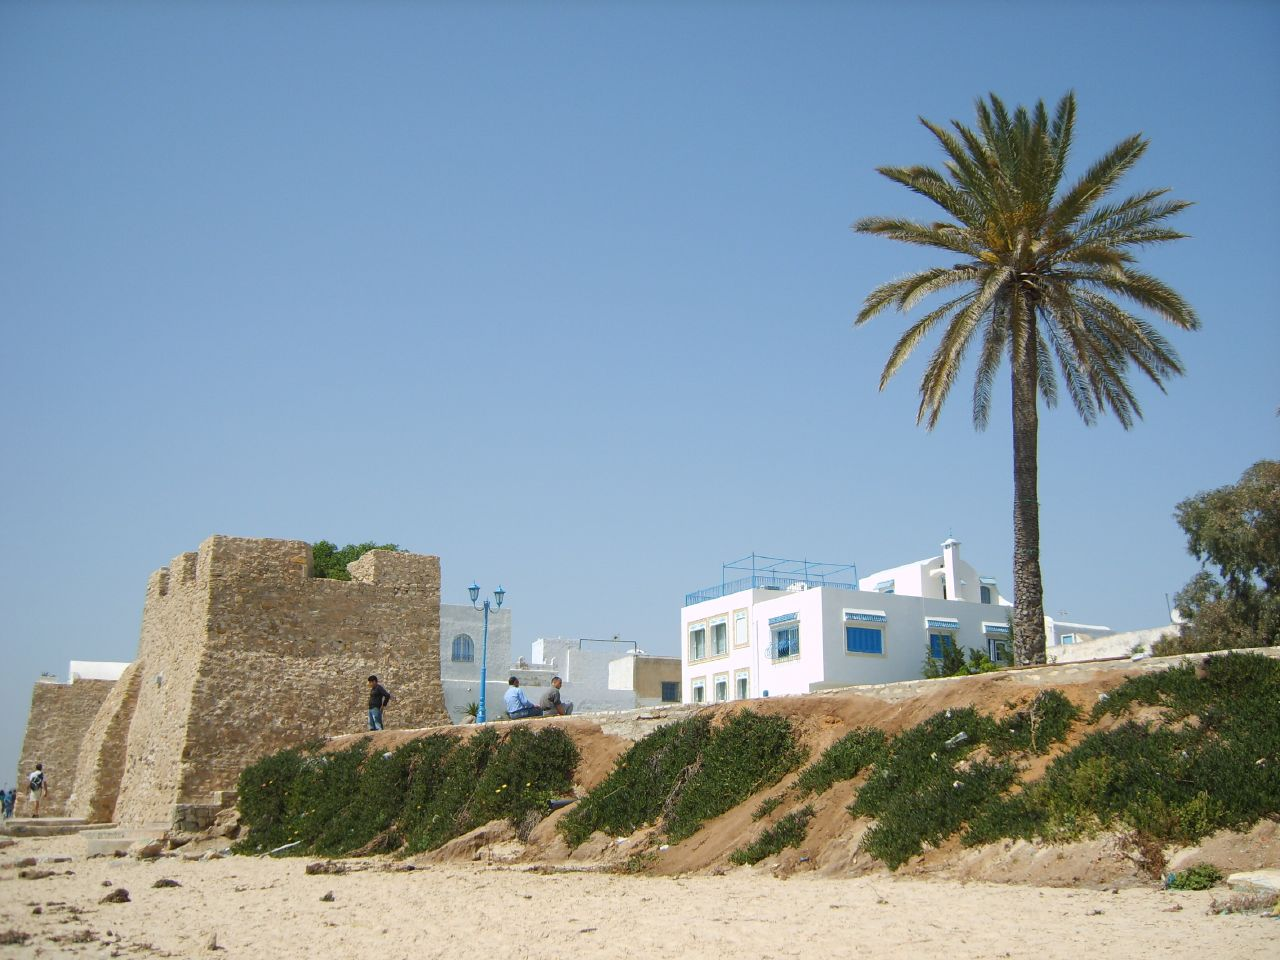 Пляж Хаммамета, старый форт